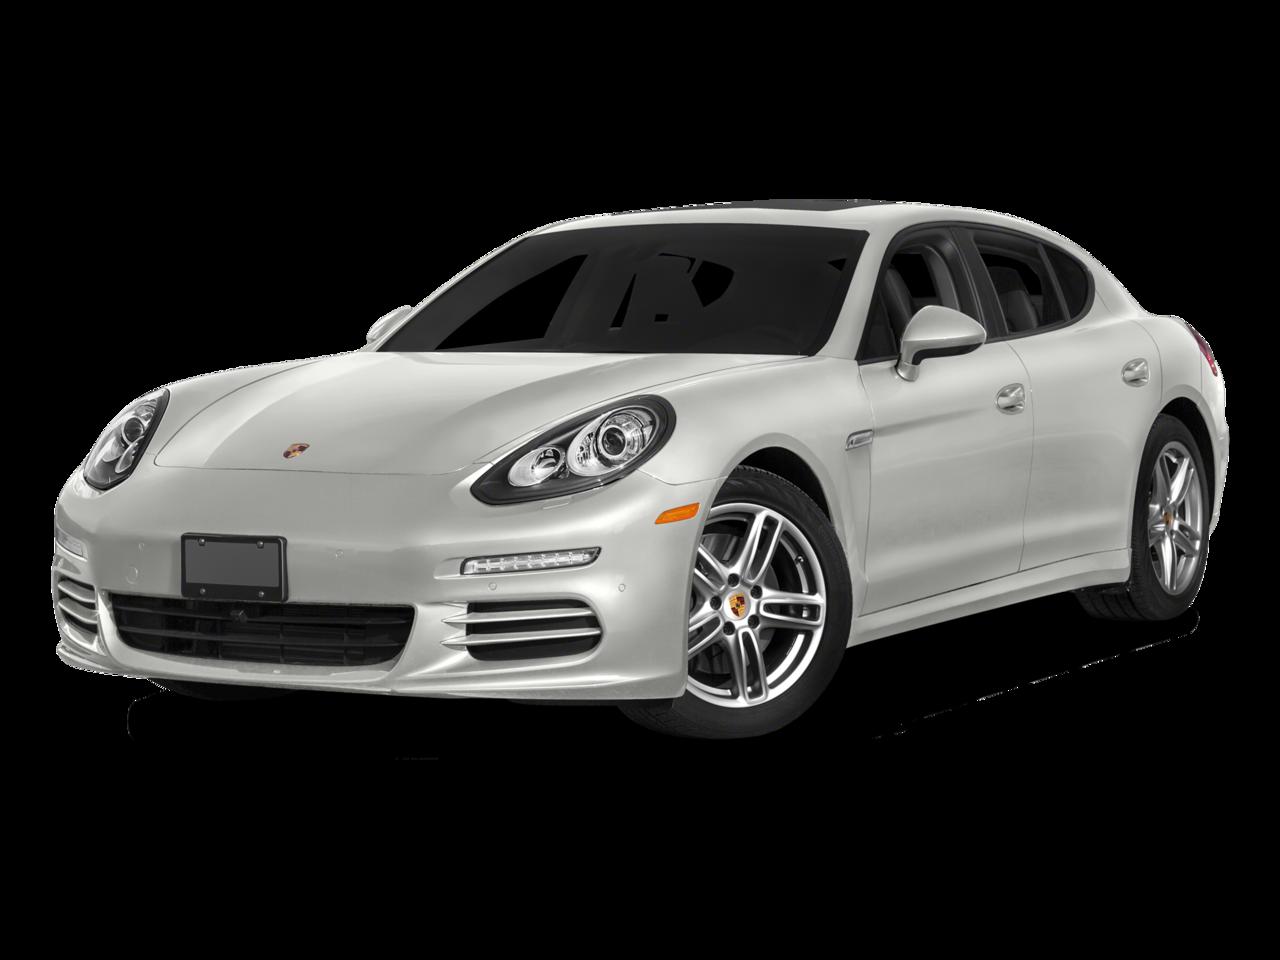 Porsche Panamera (09-16) (970)